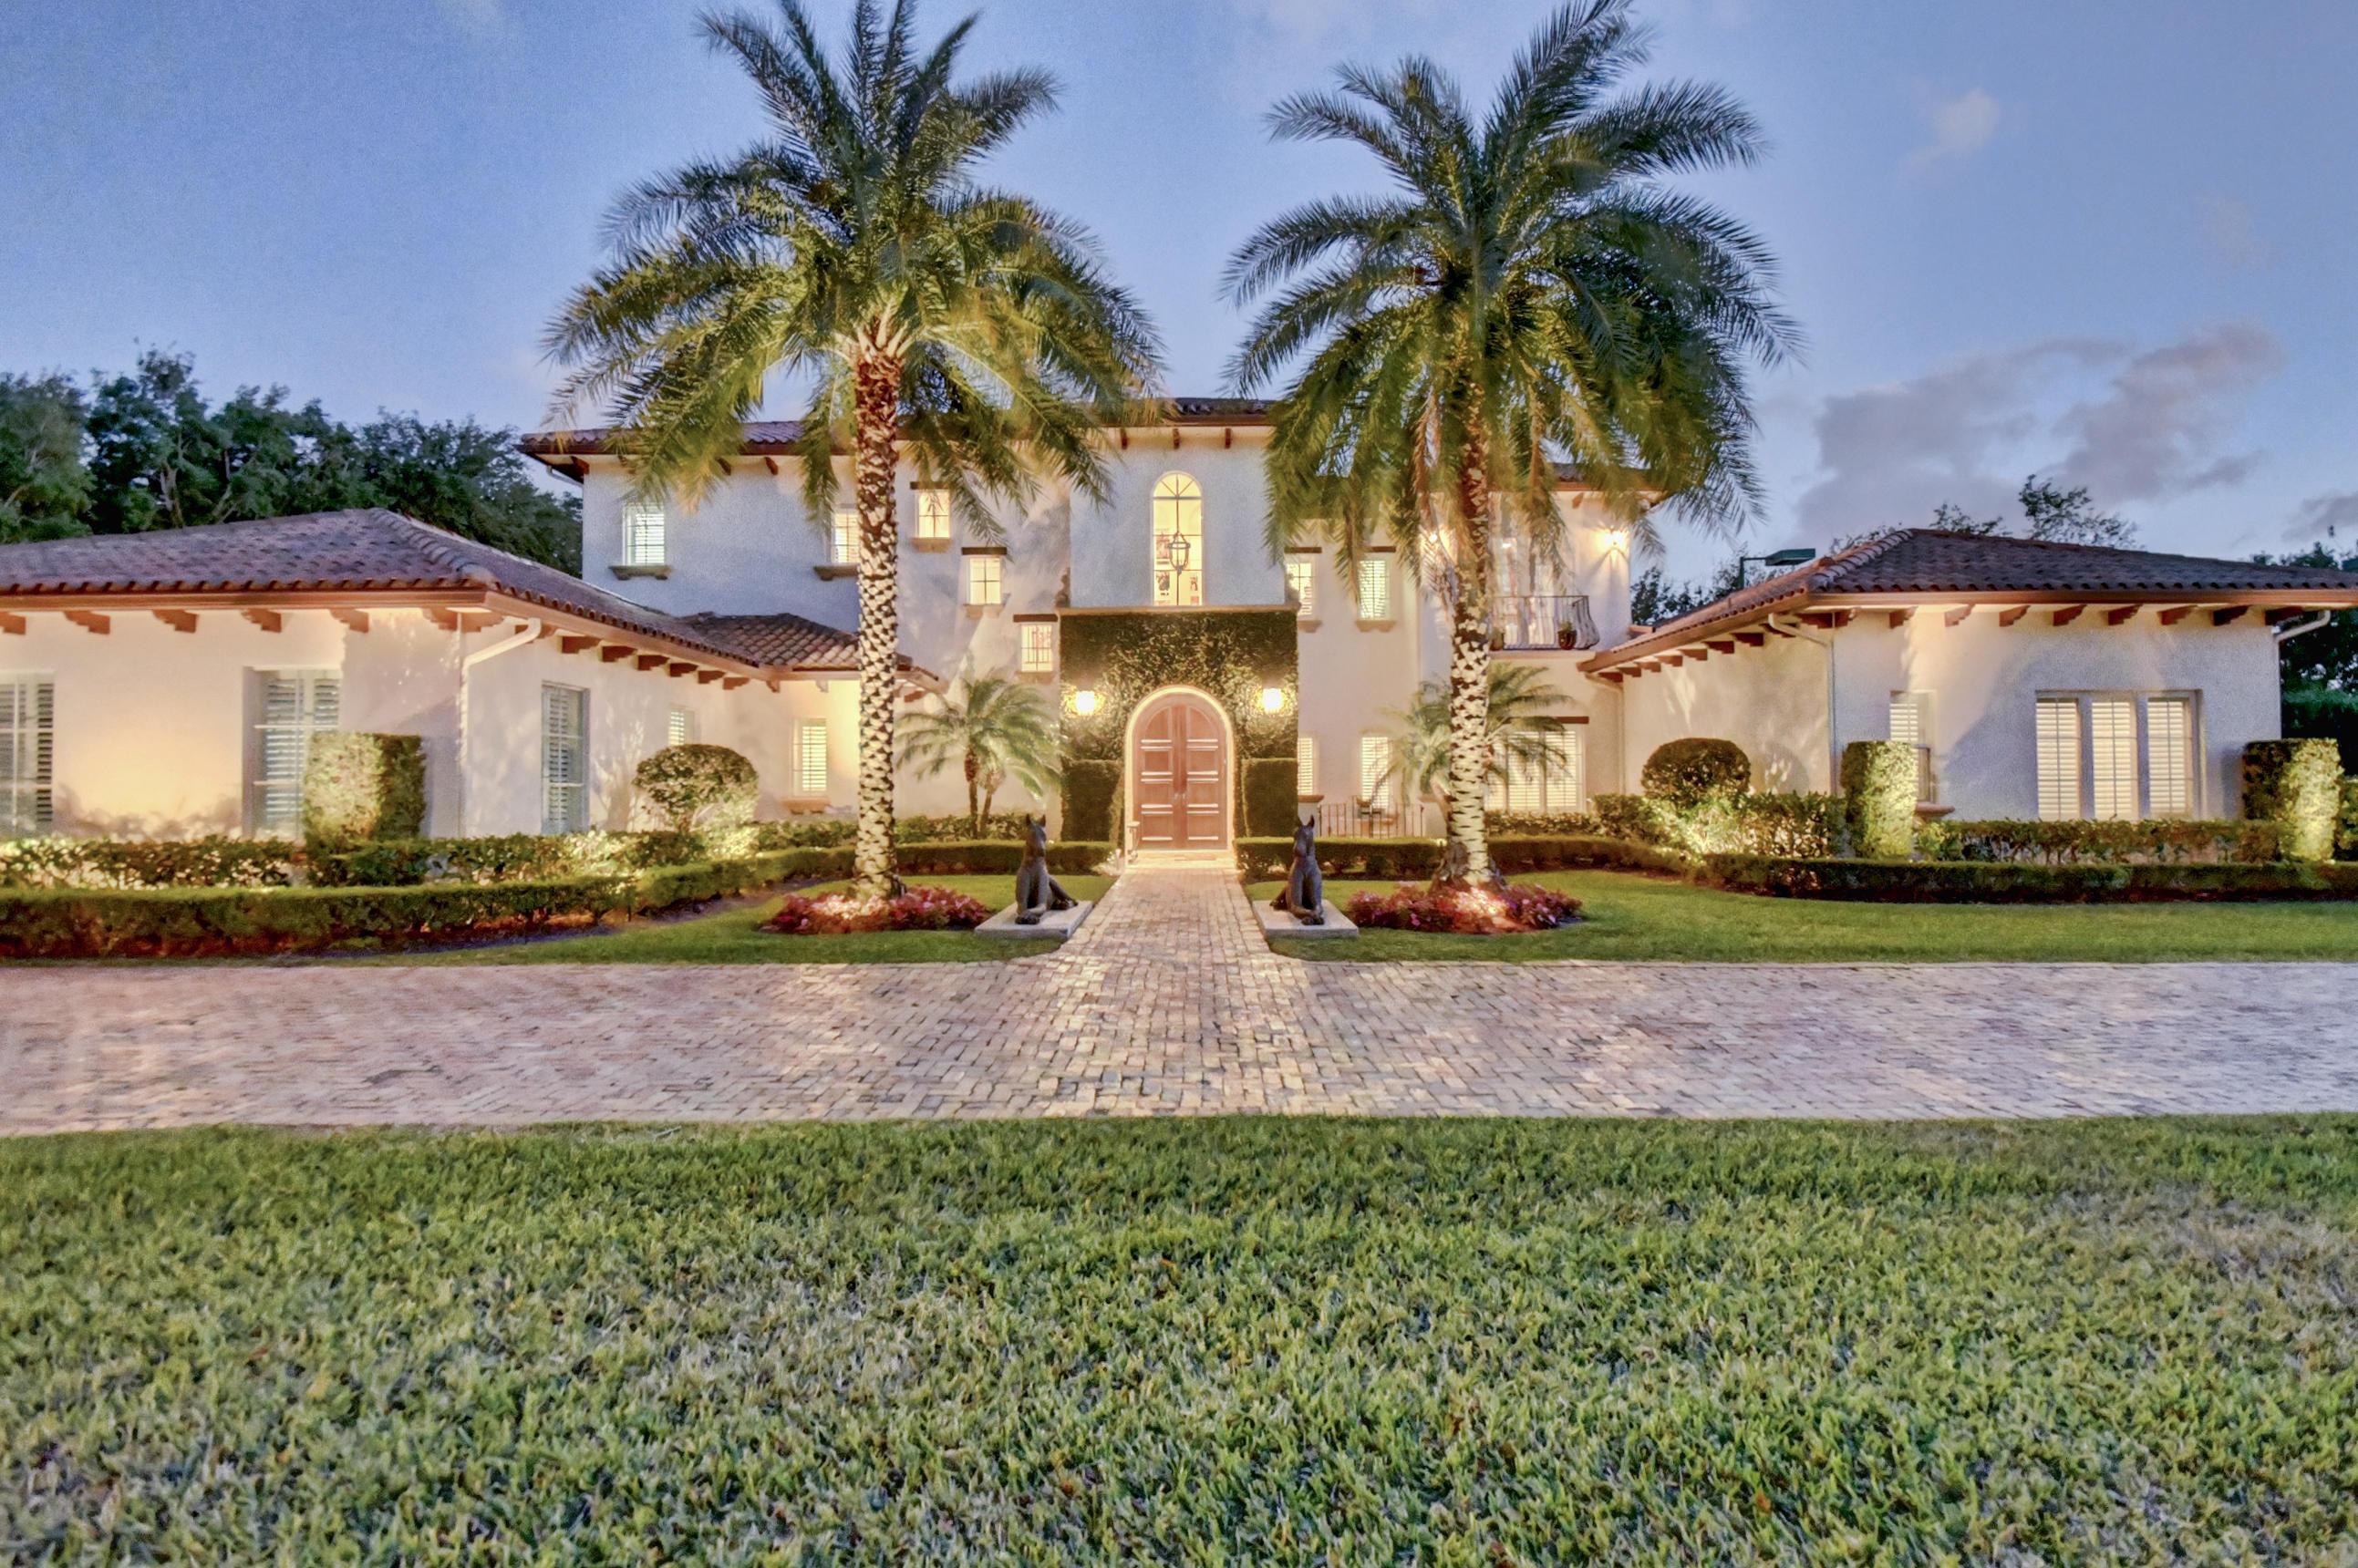 Home for sale in Boniello Acres Boca Raton Florida